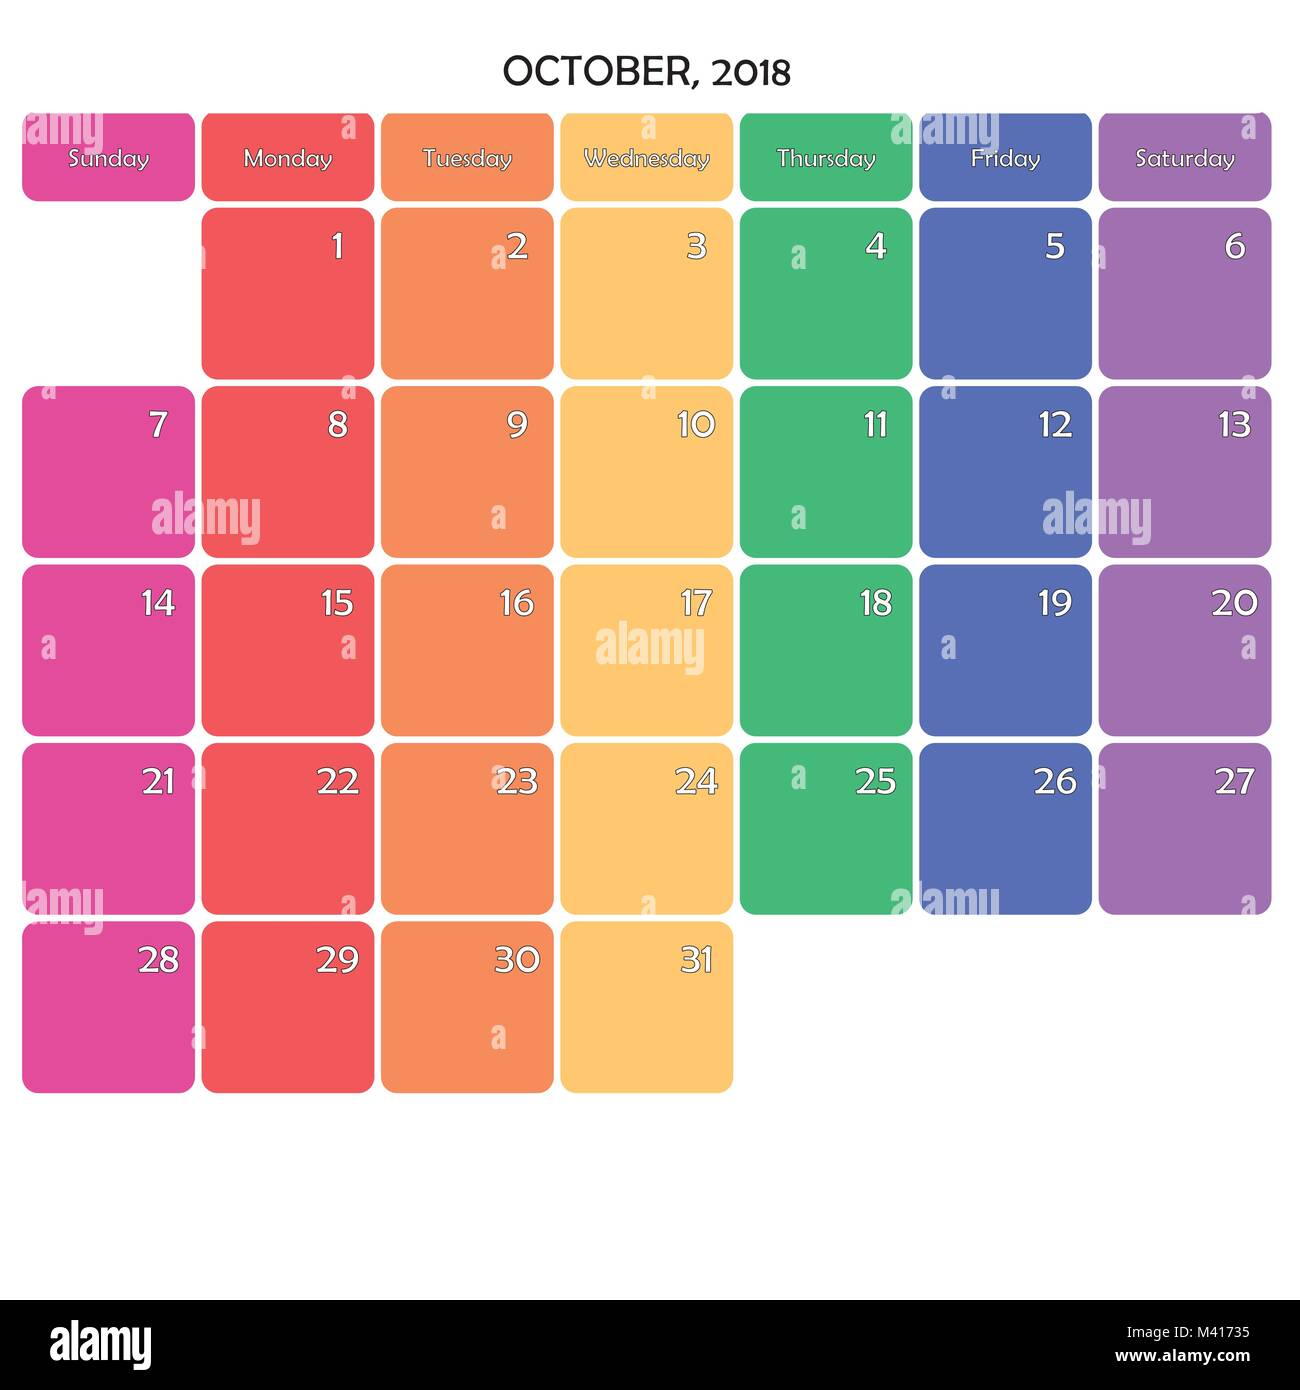 october 2018 editable calendar